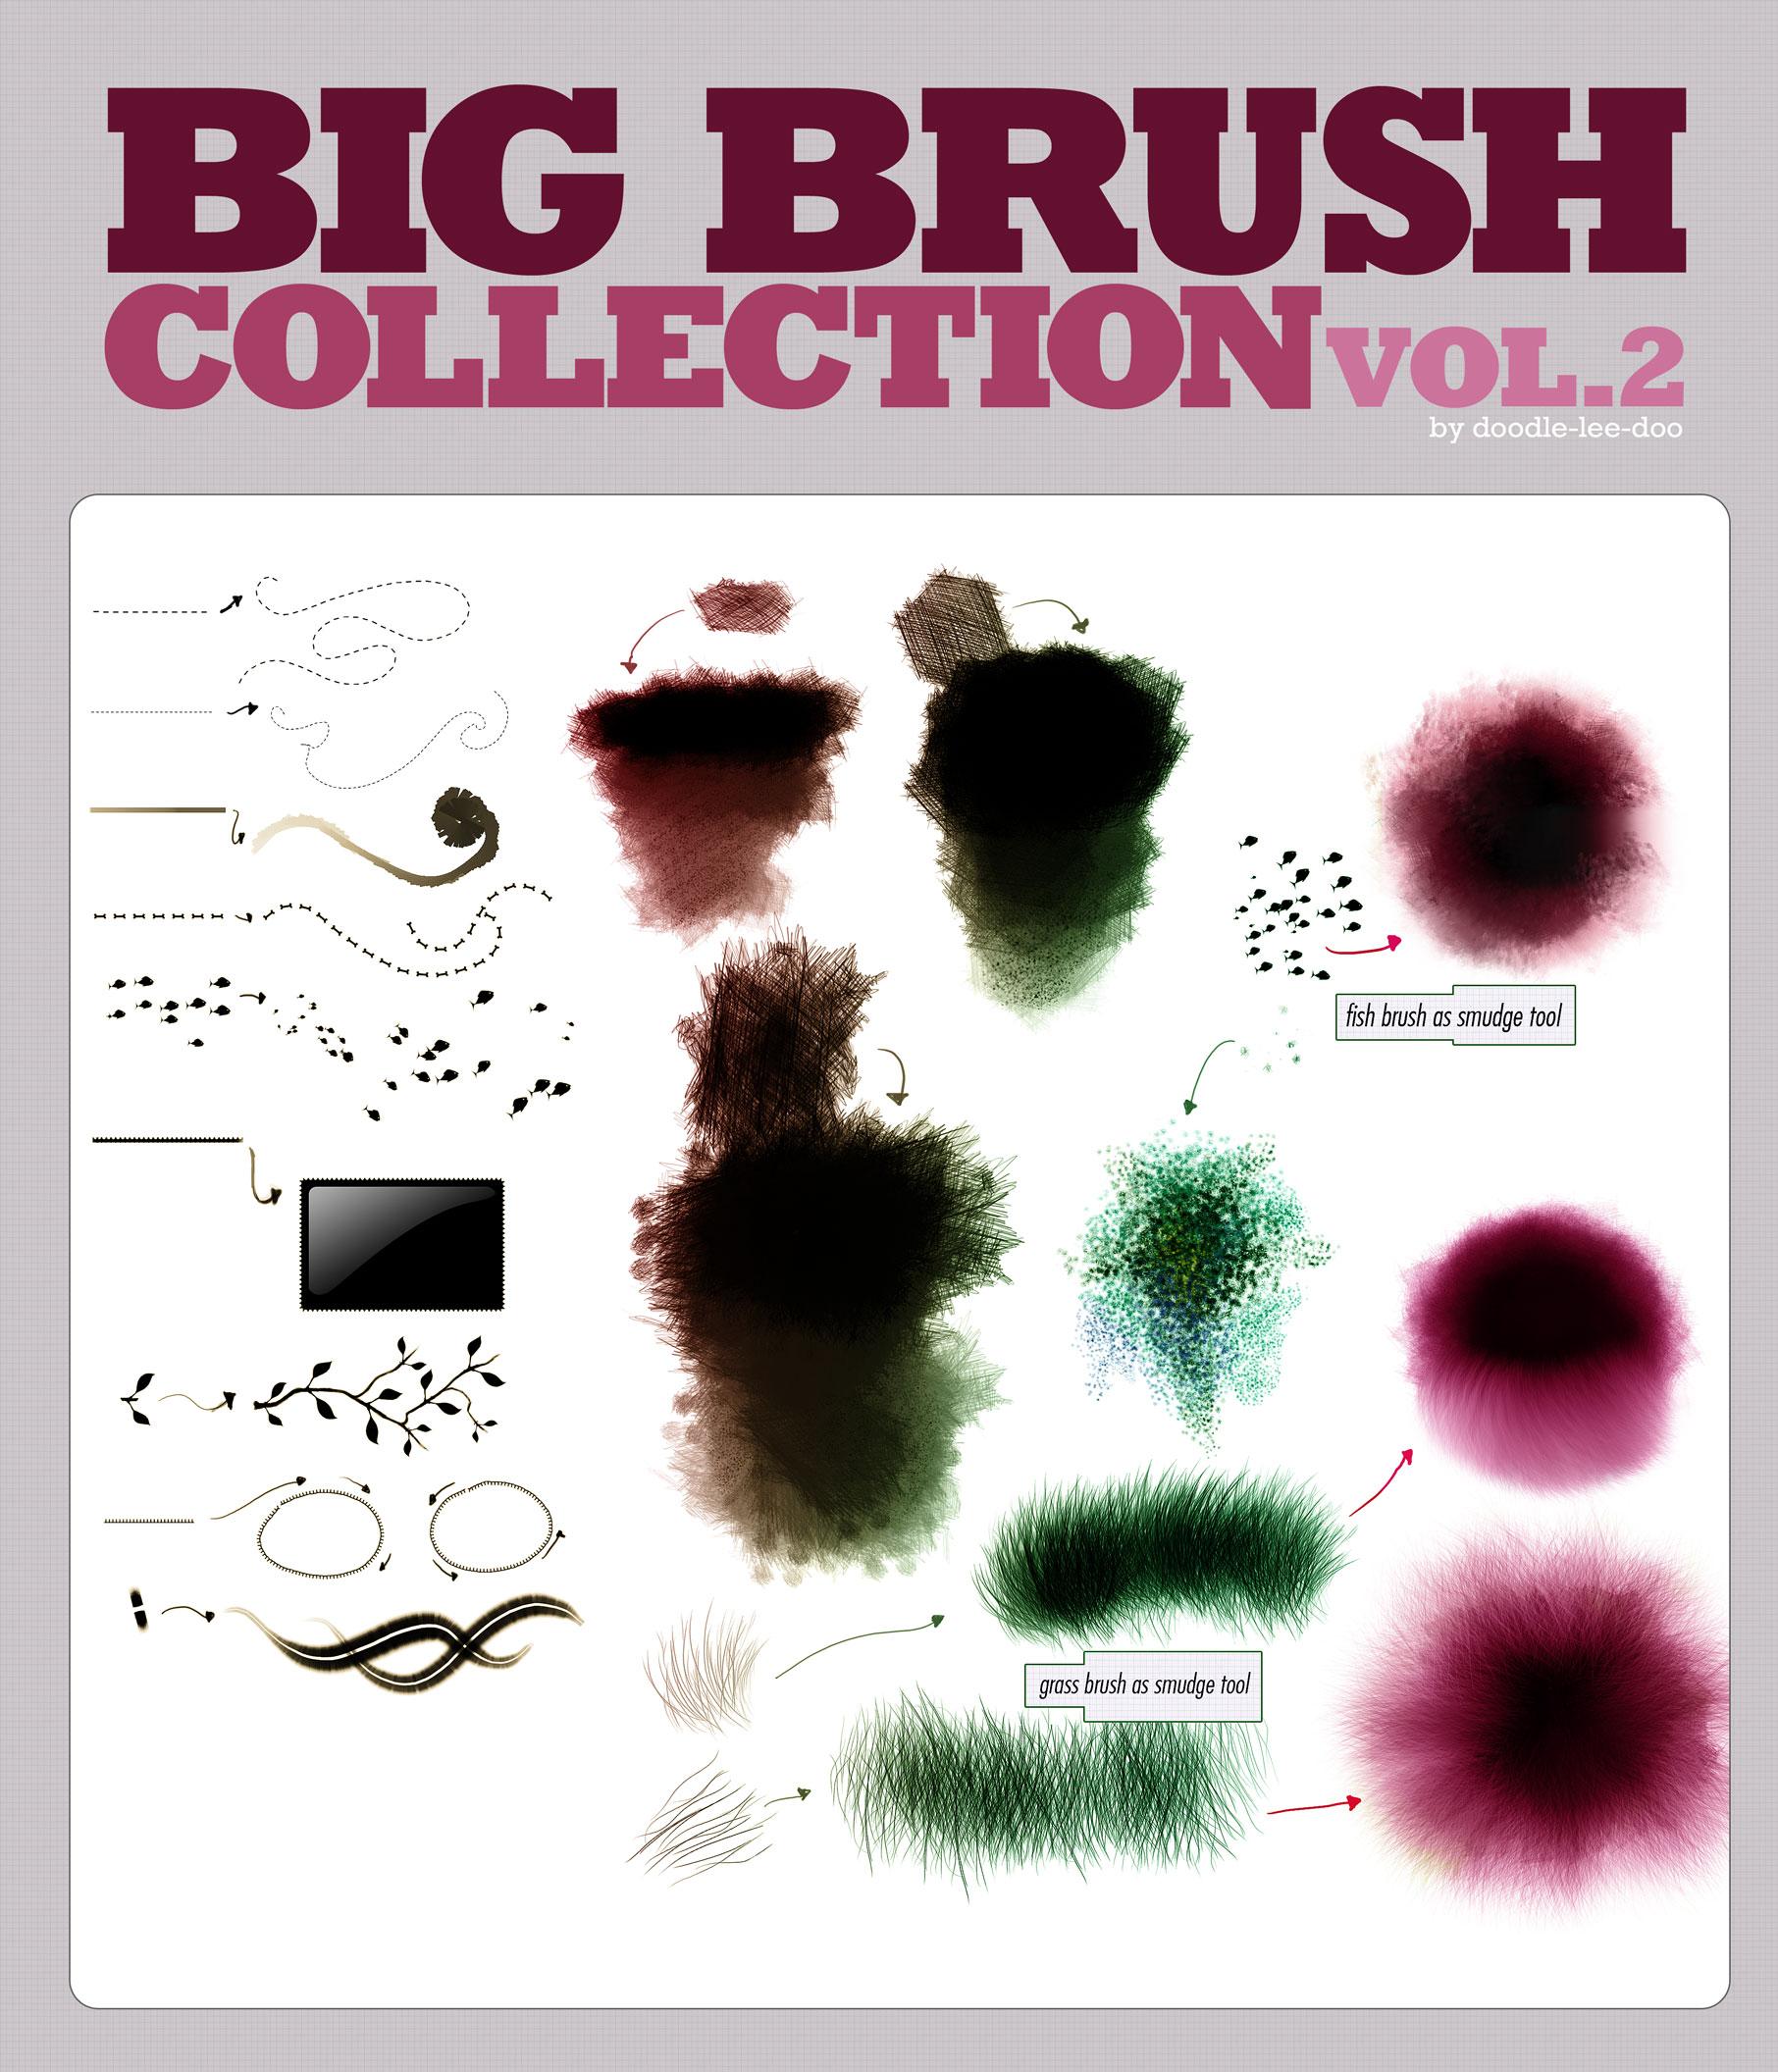 Big brush collection vol.2